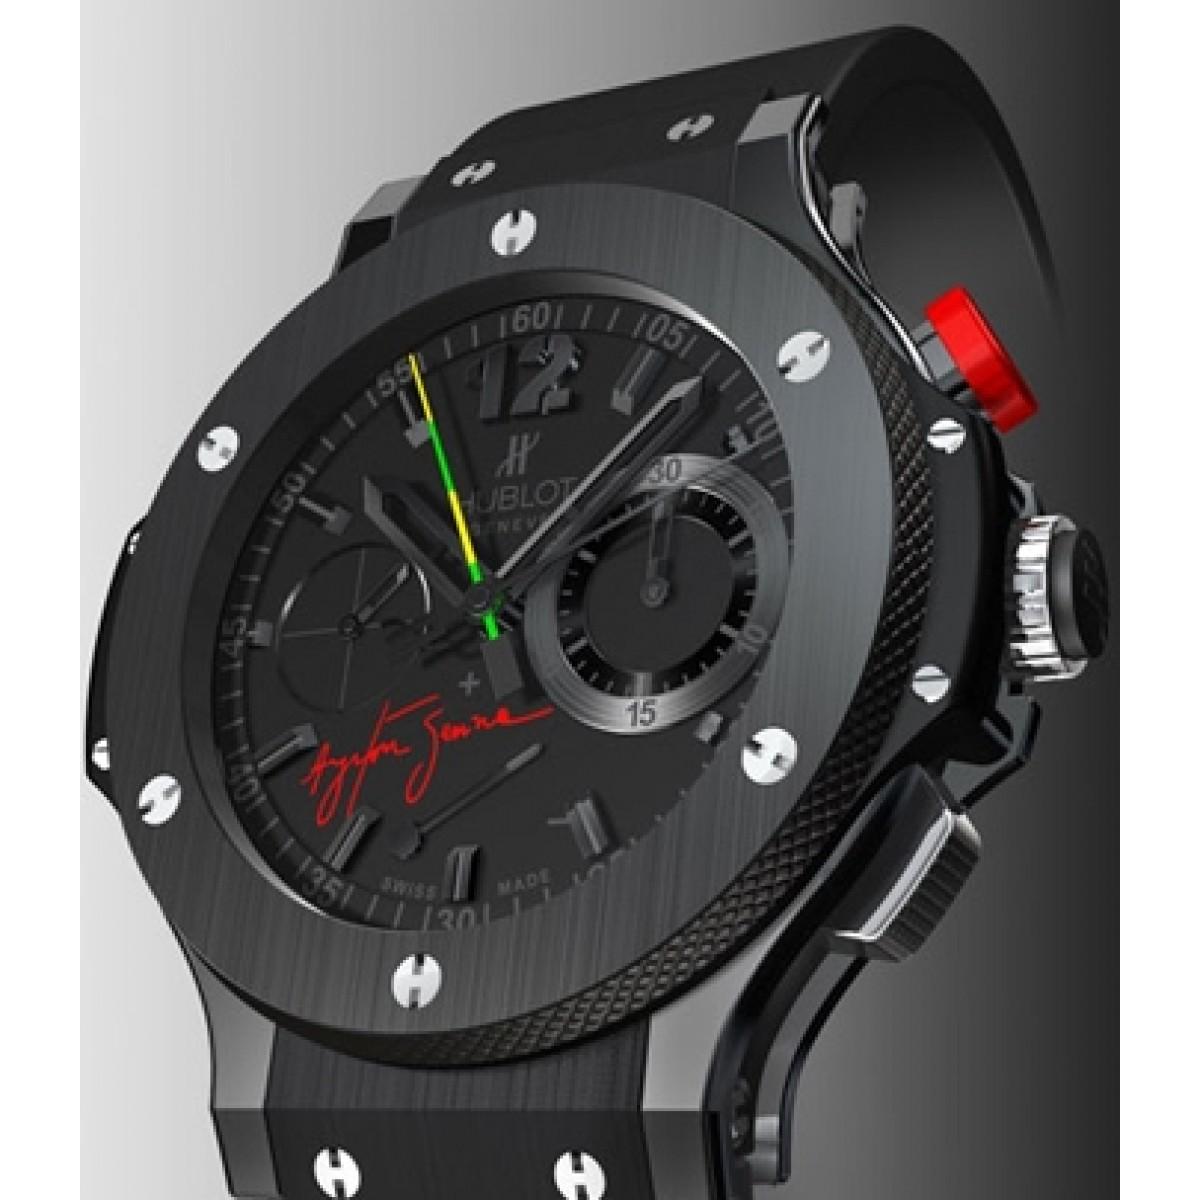 6c48239f971 Relógio Réplica Hublot Big Band Black Ceramic Ayrton Senna